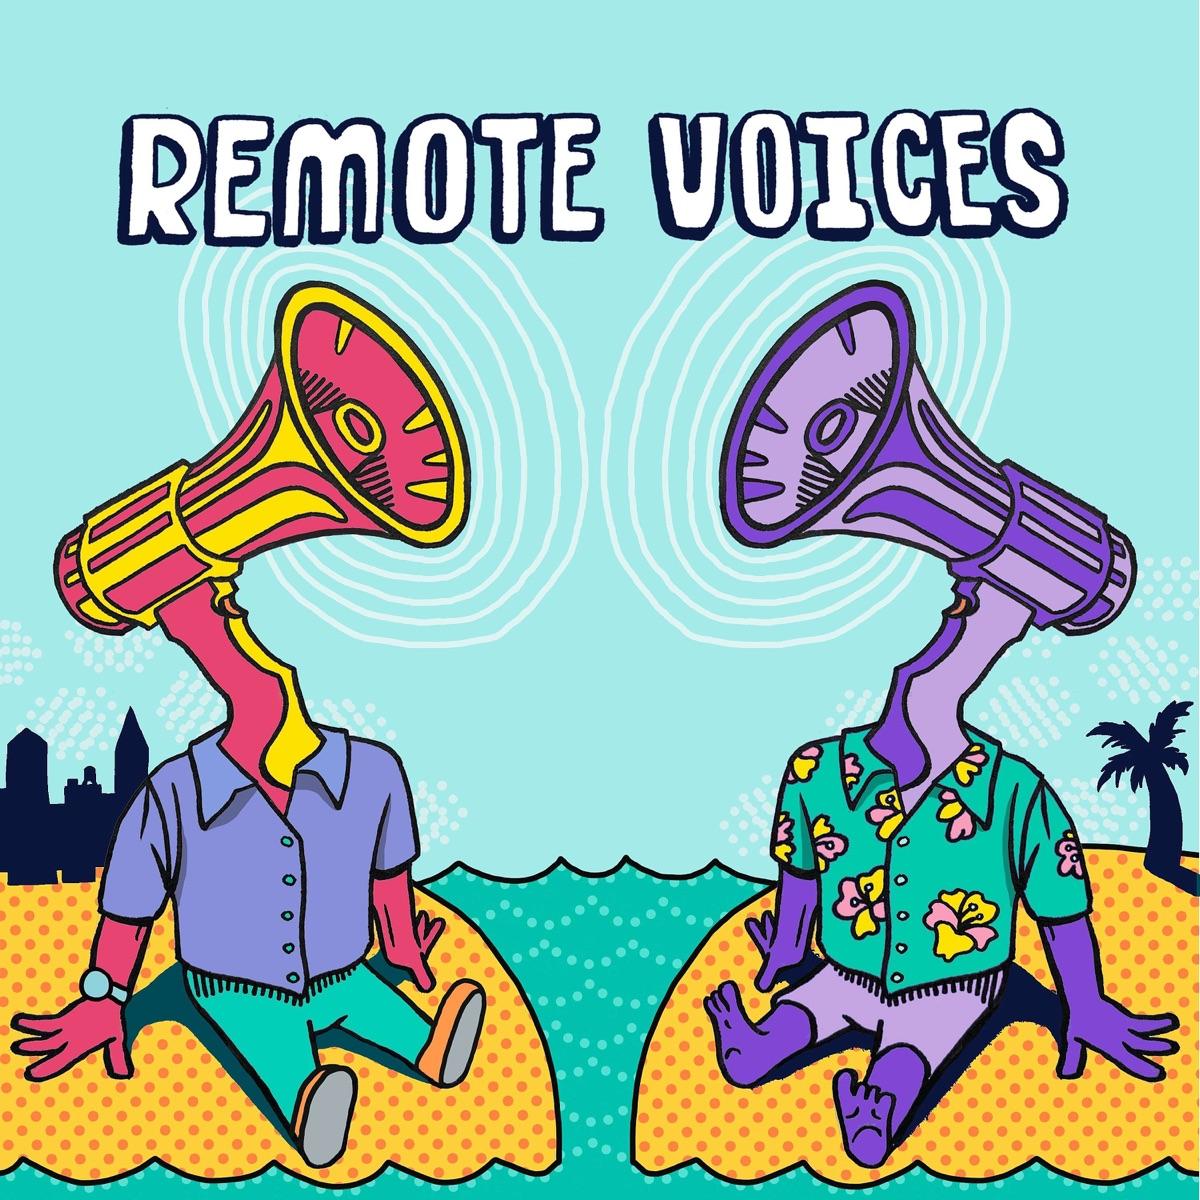 Remote Voices